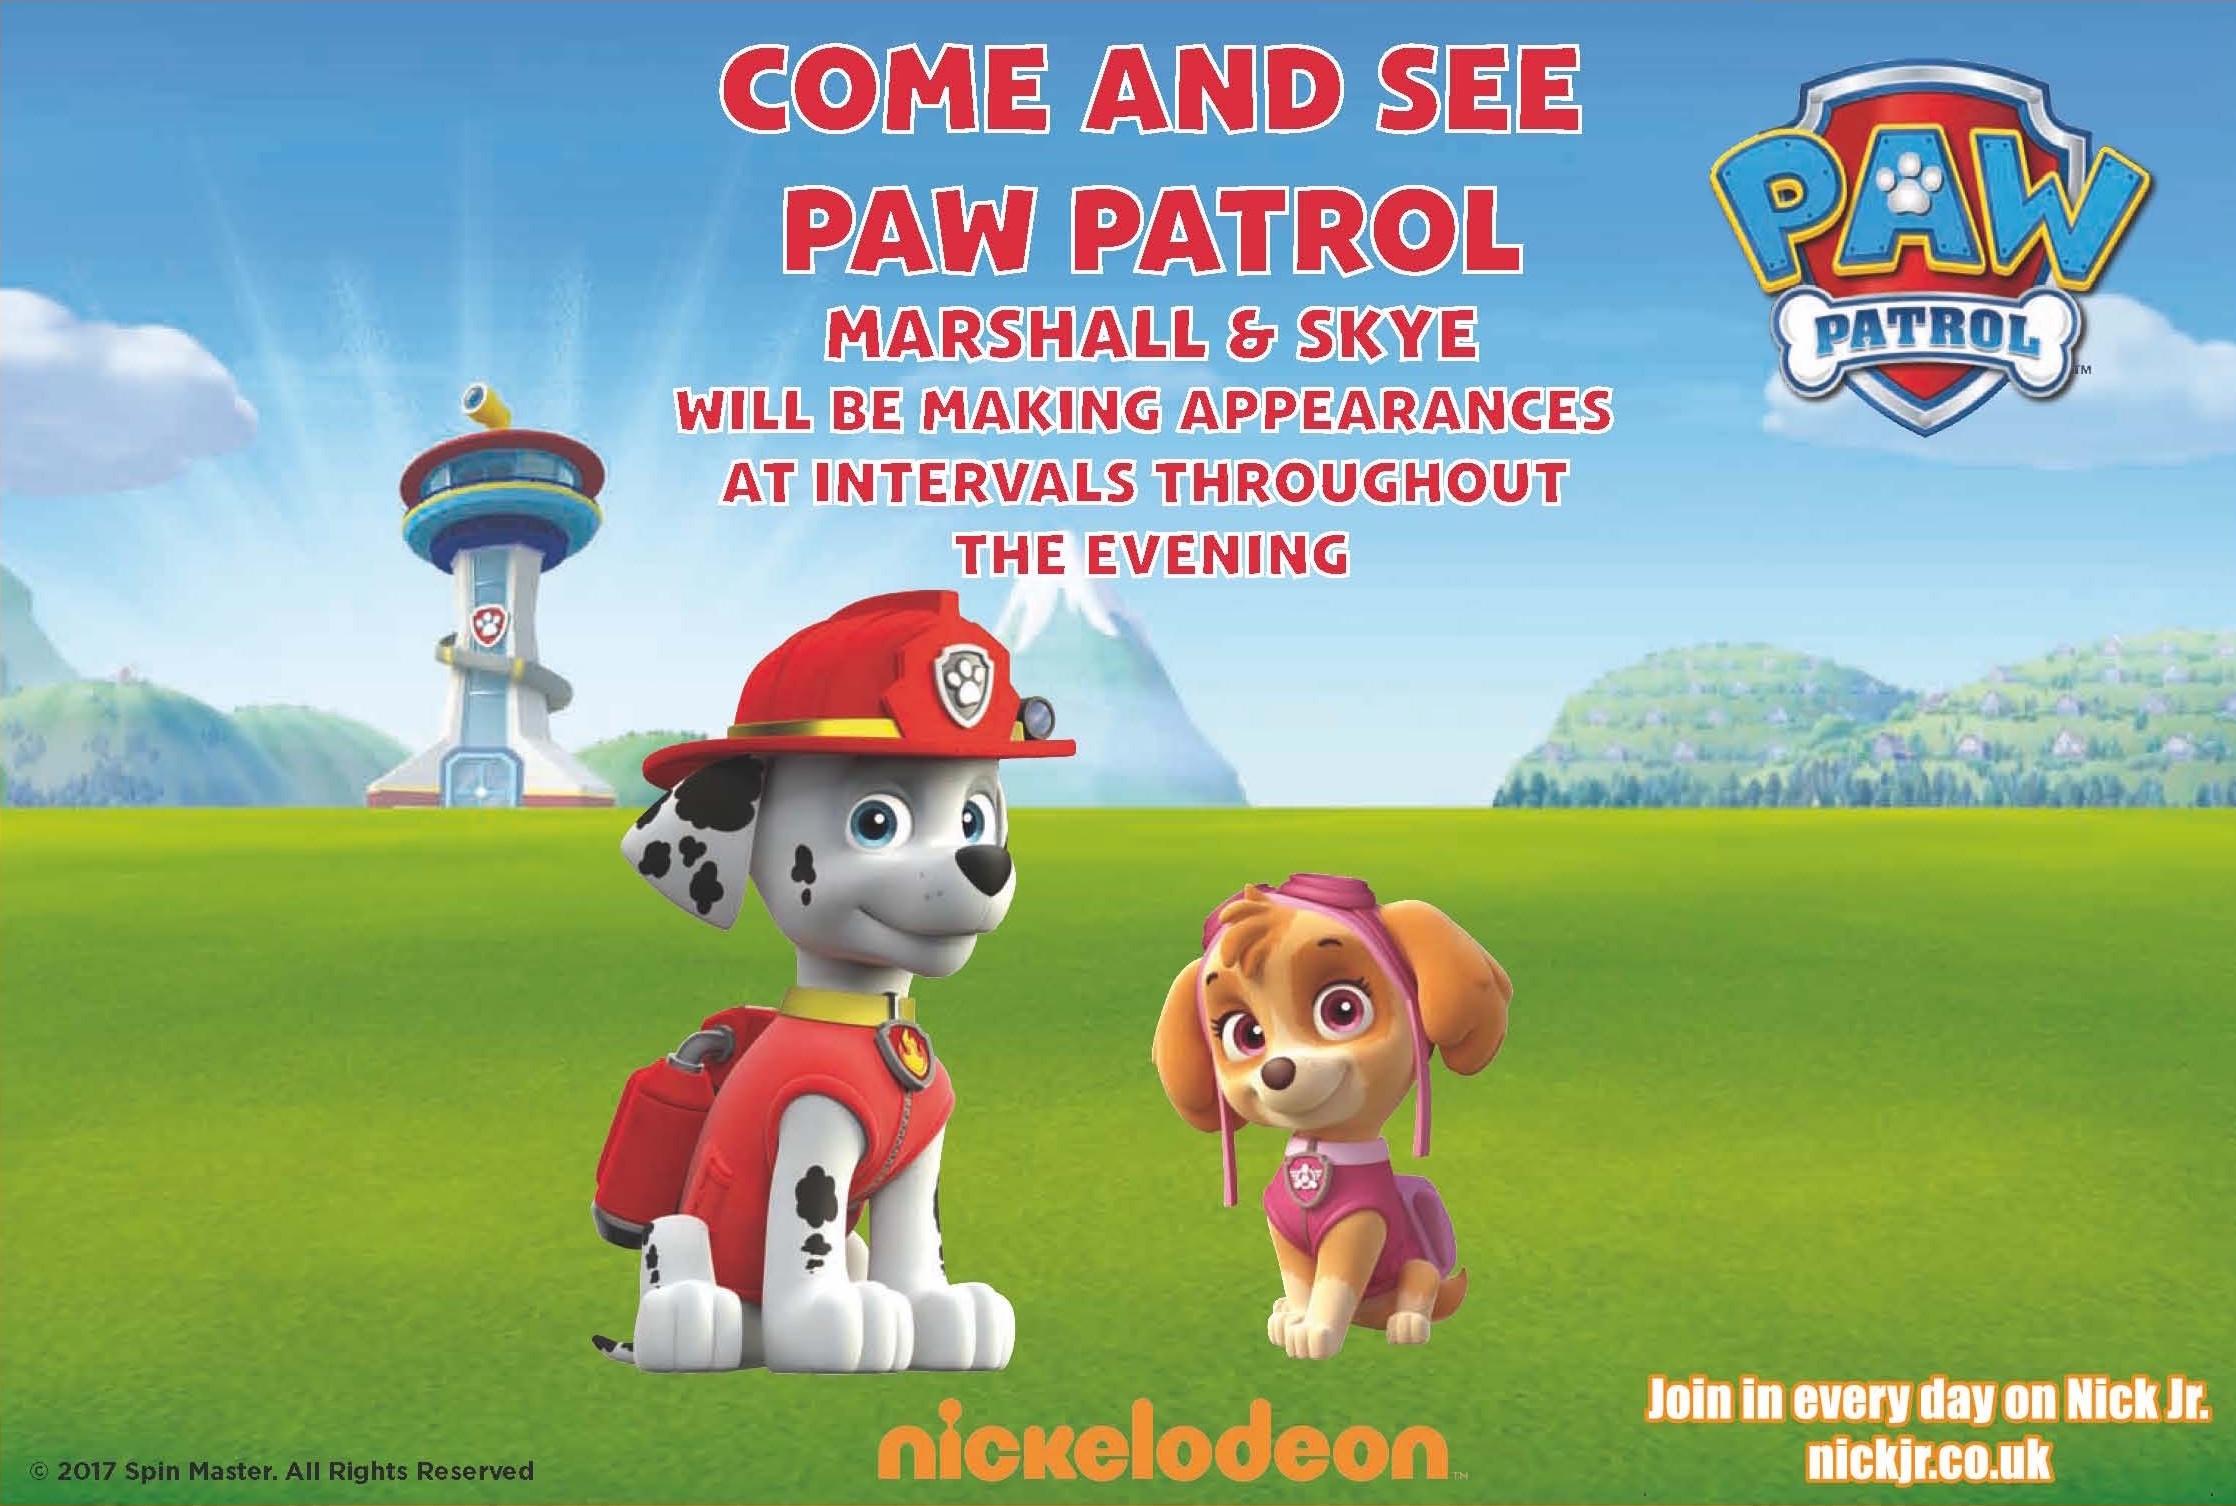 Paw Patrol Cheltenham RoundTable Fireworks